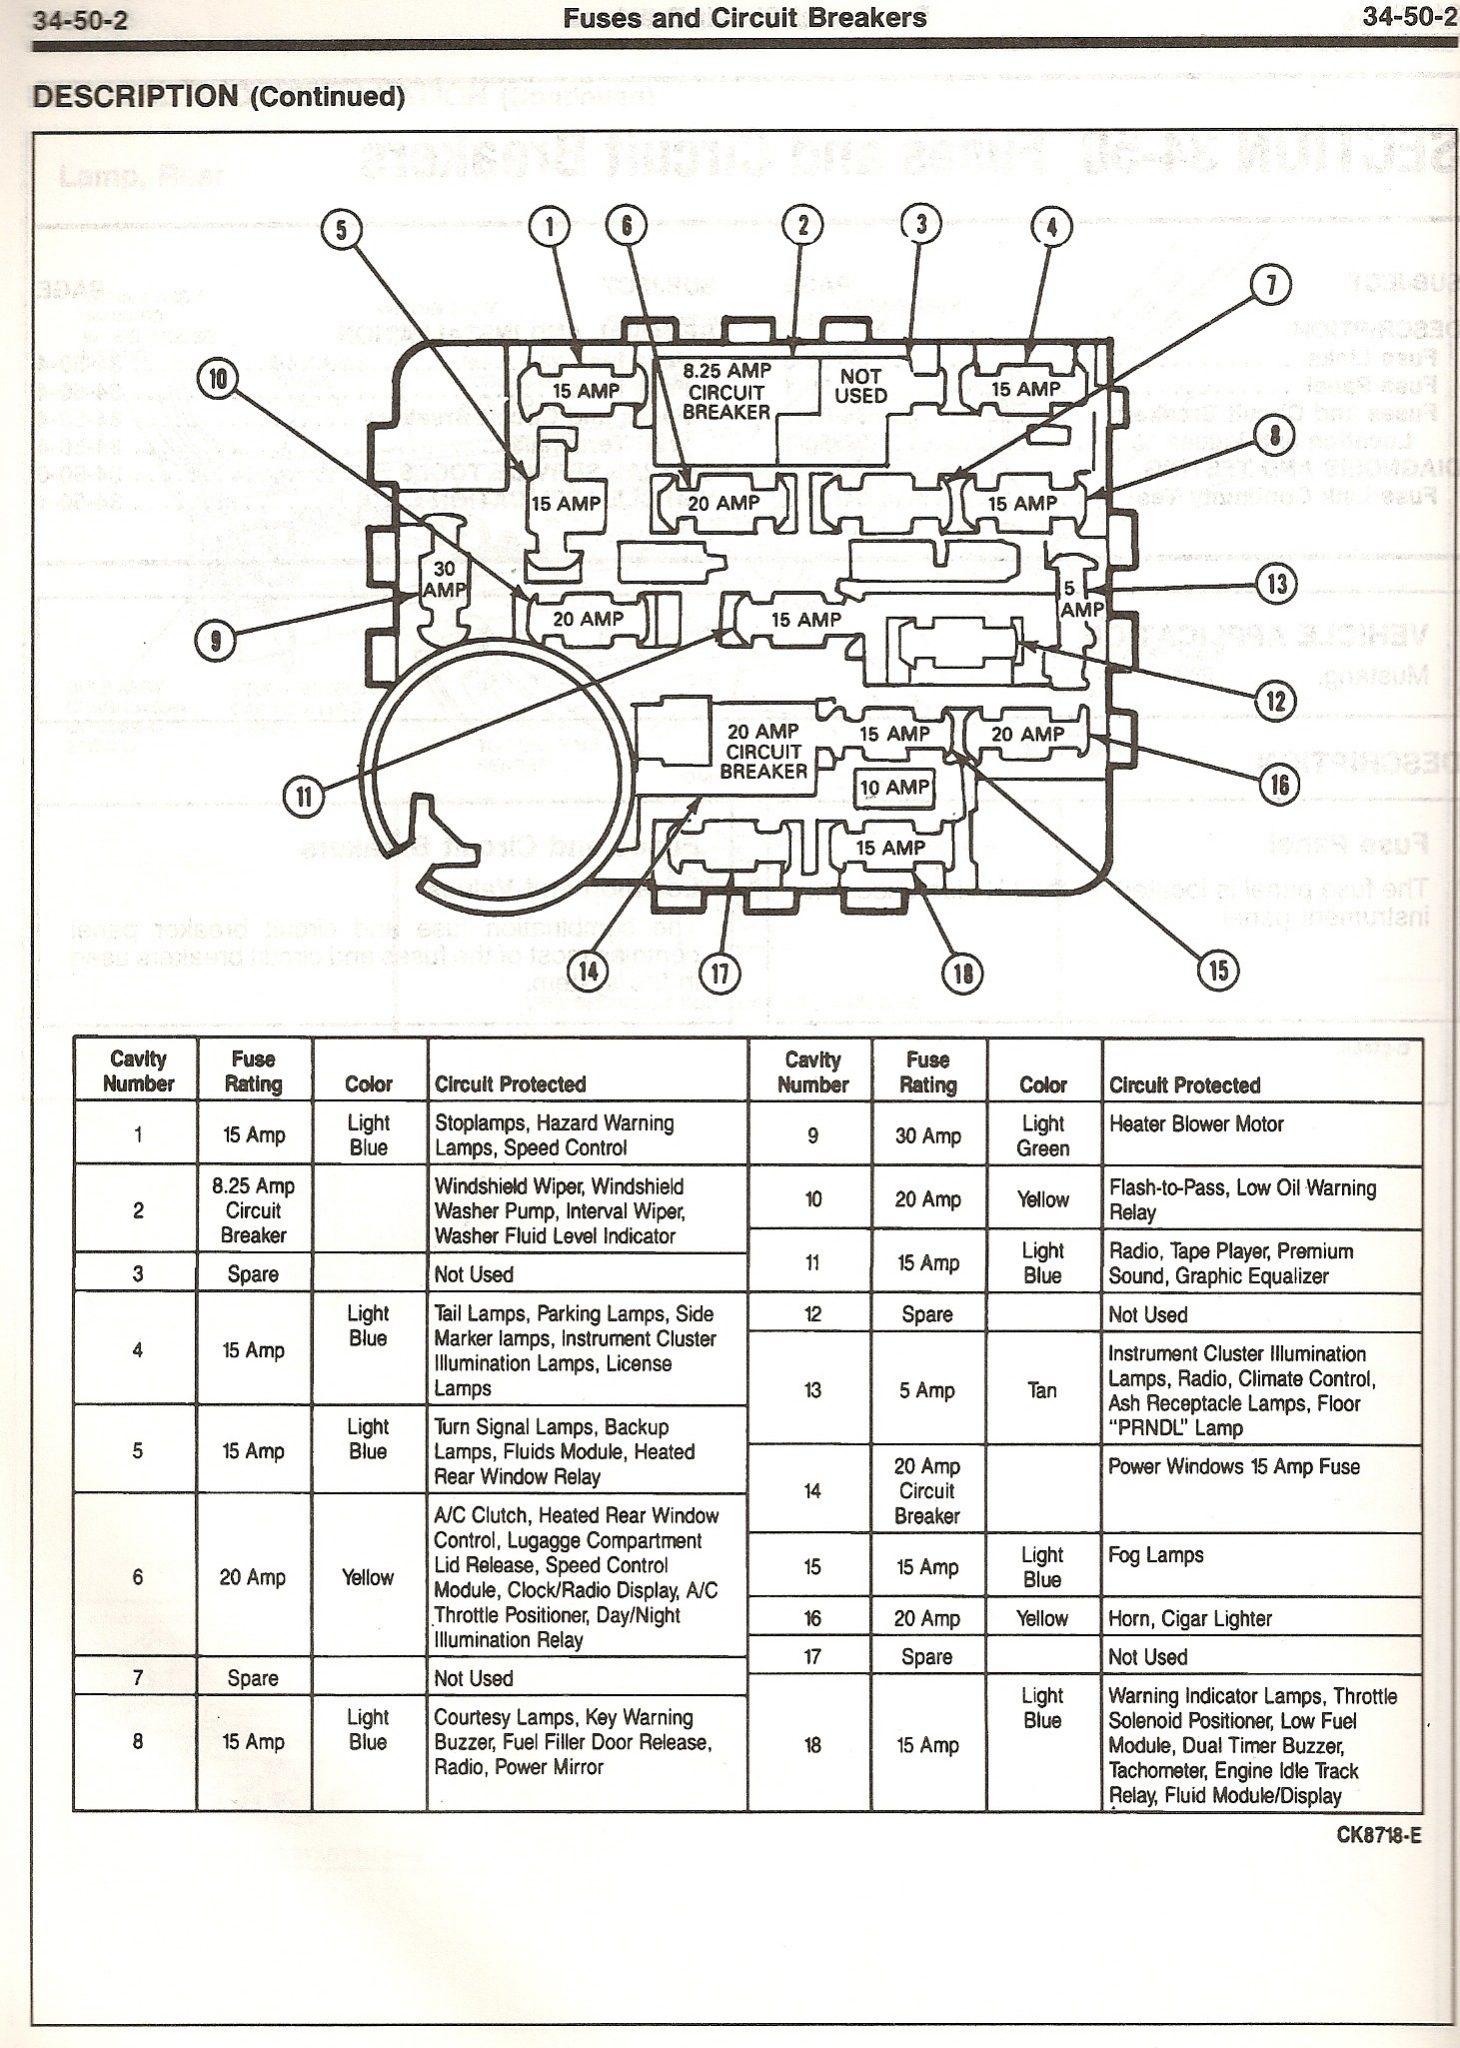 wrg 4272] 2007 f250 fuse box1990 camaro fuse panel diagram electrical wiring diagrams 1990 f250 fuse box diagram